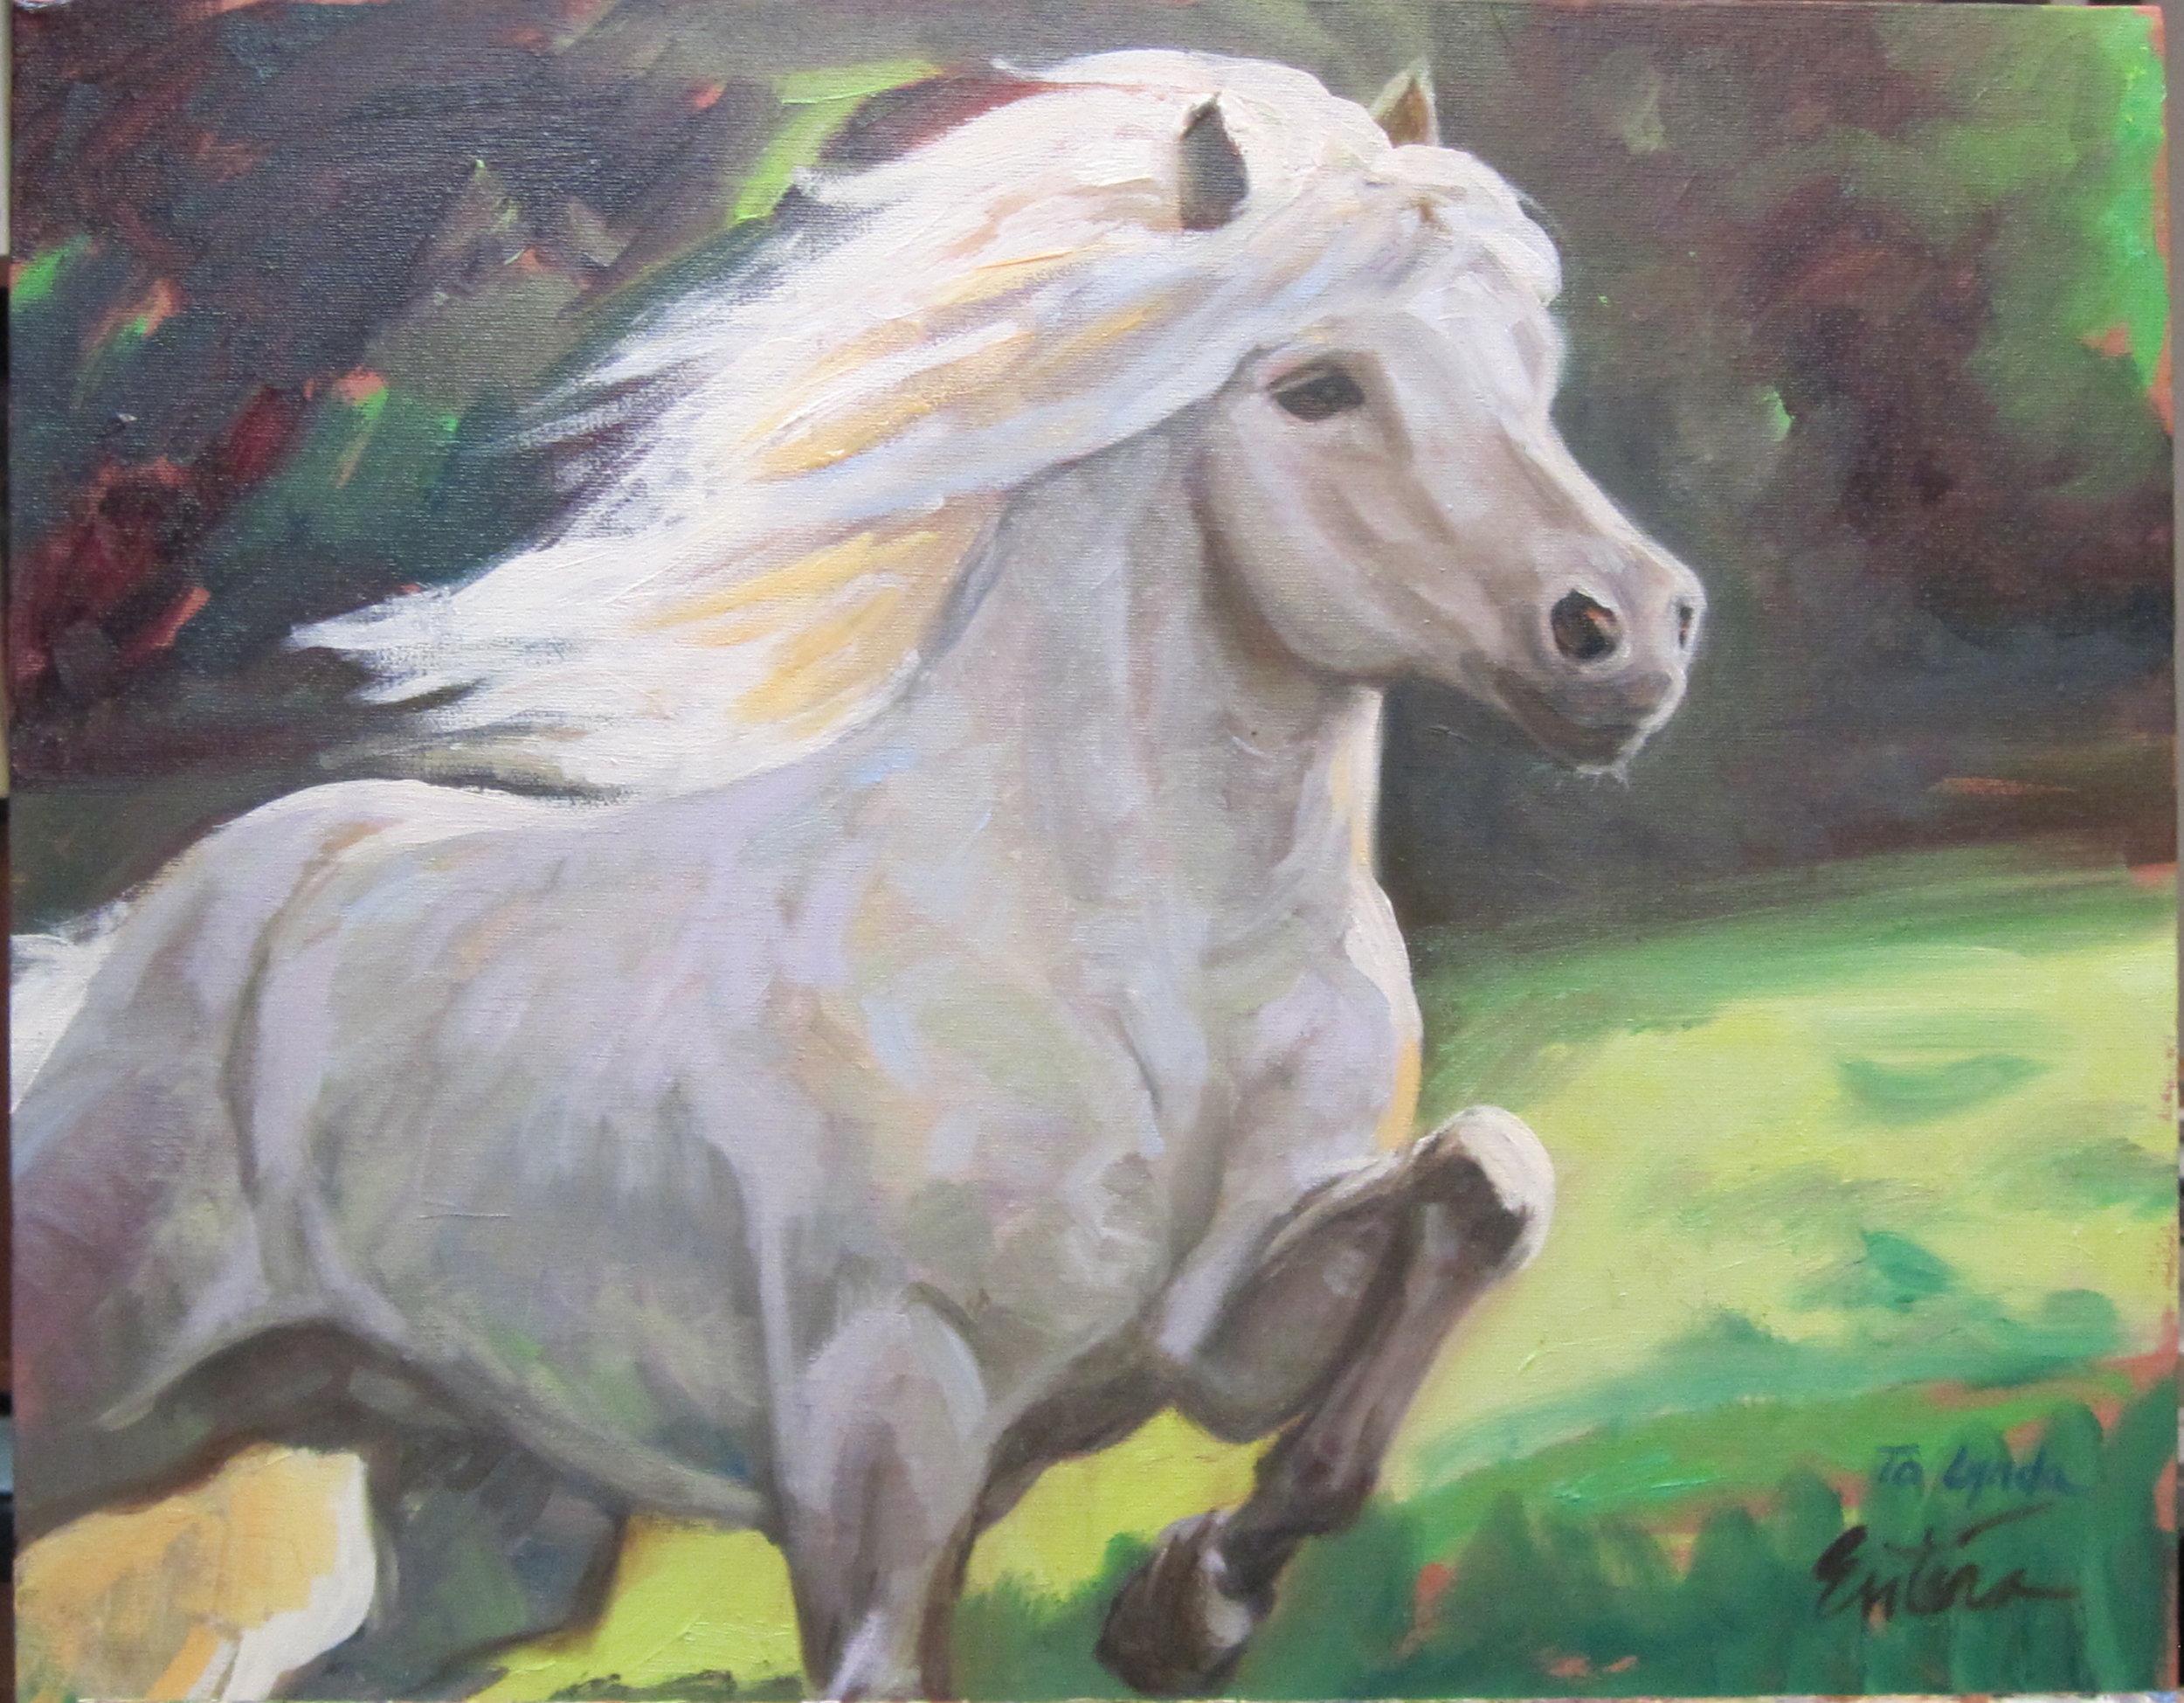 Lynda_s horse.jpg